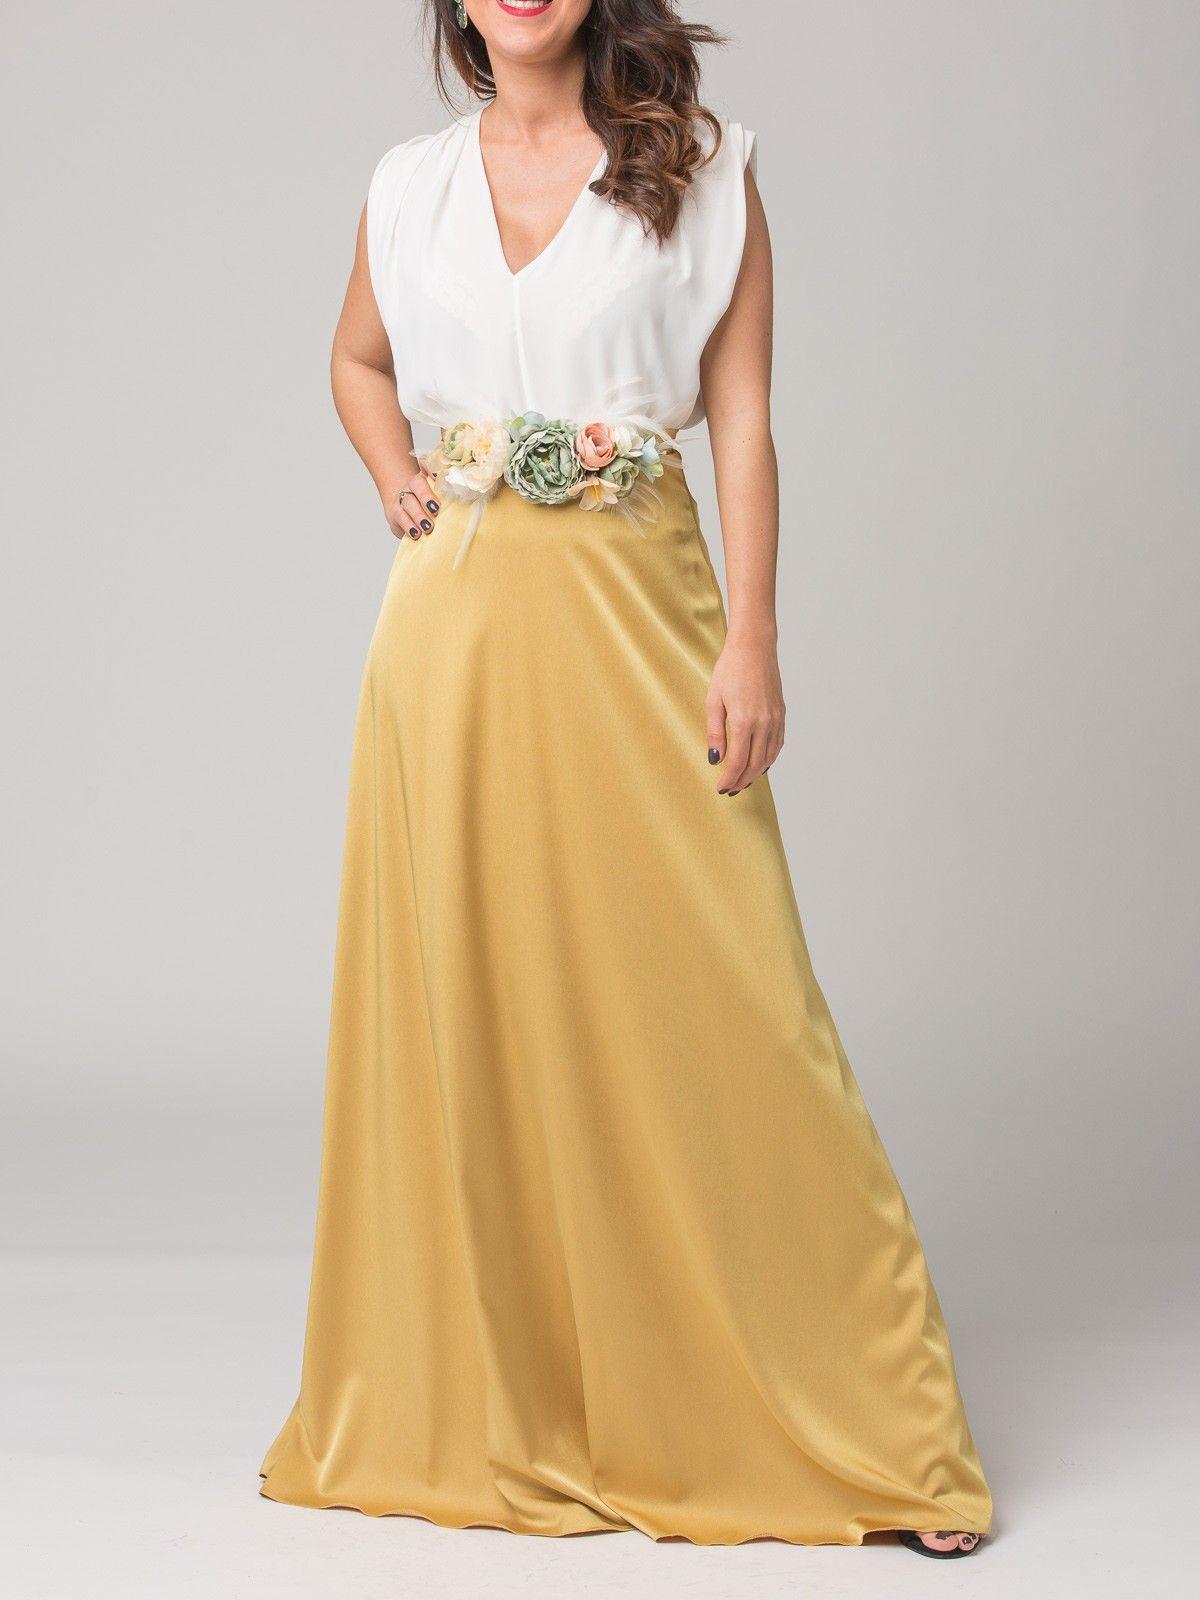 e22ed6d999 Falda Balbina - Falda larga de raso en color mostaza. Cierre con cremallera  invisible trasera